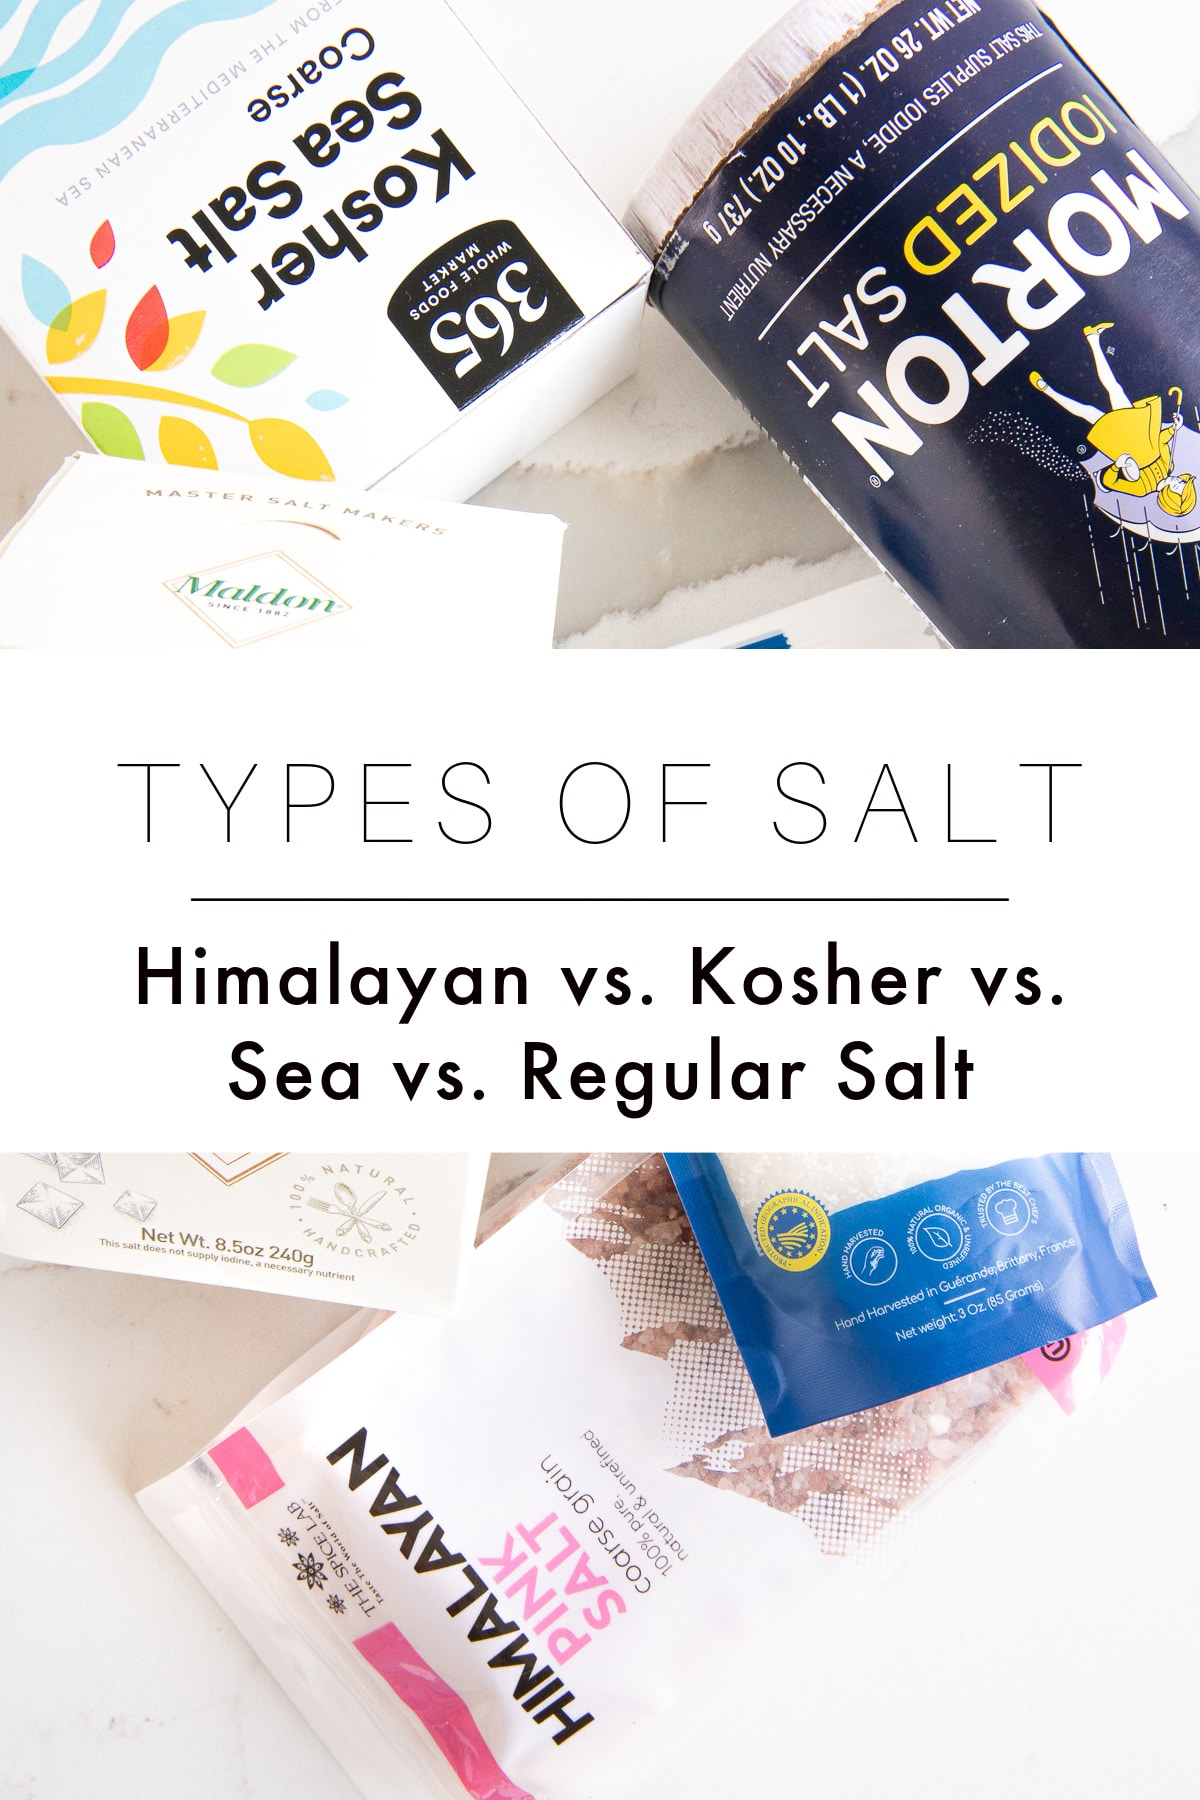 "Image showing five different types of salt in their original packaging arranged on a slab of quartz with text overlay ""types of salt: Himalayan vs. Kosher vs. Sea vs. Regular Salt"""